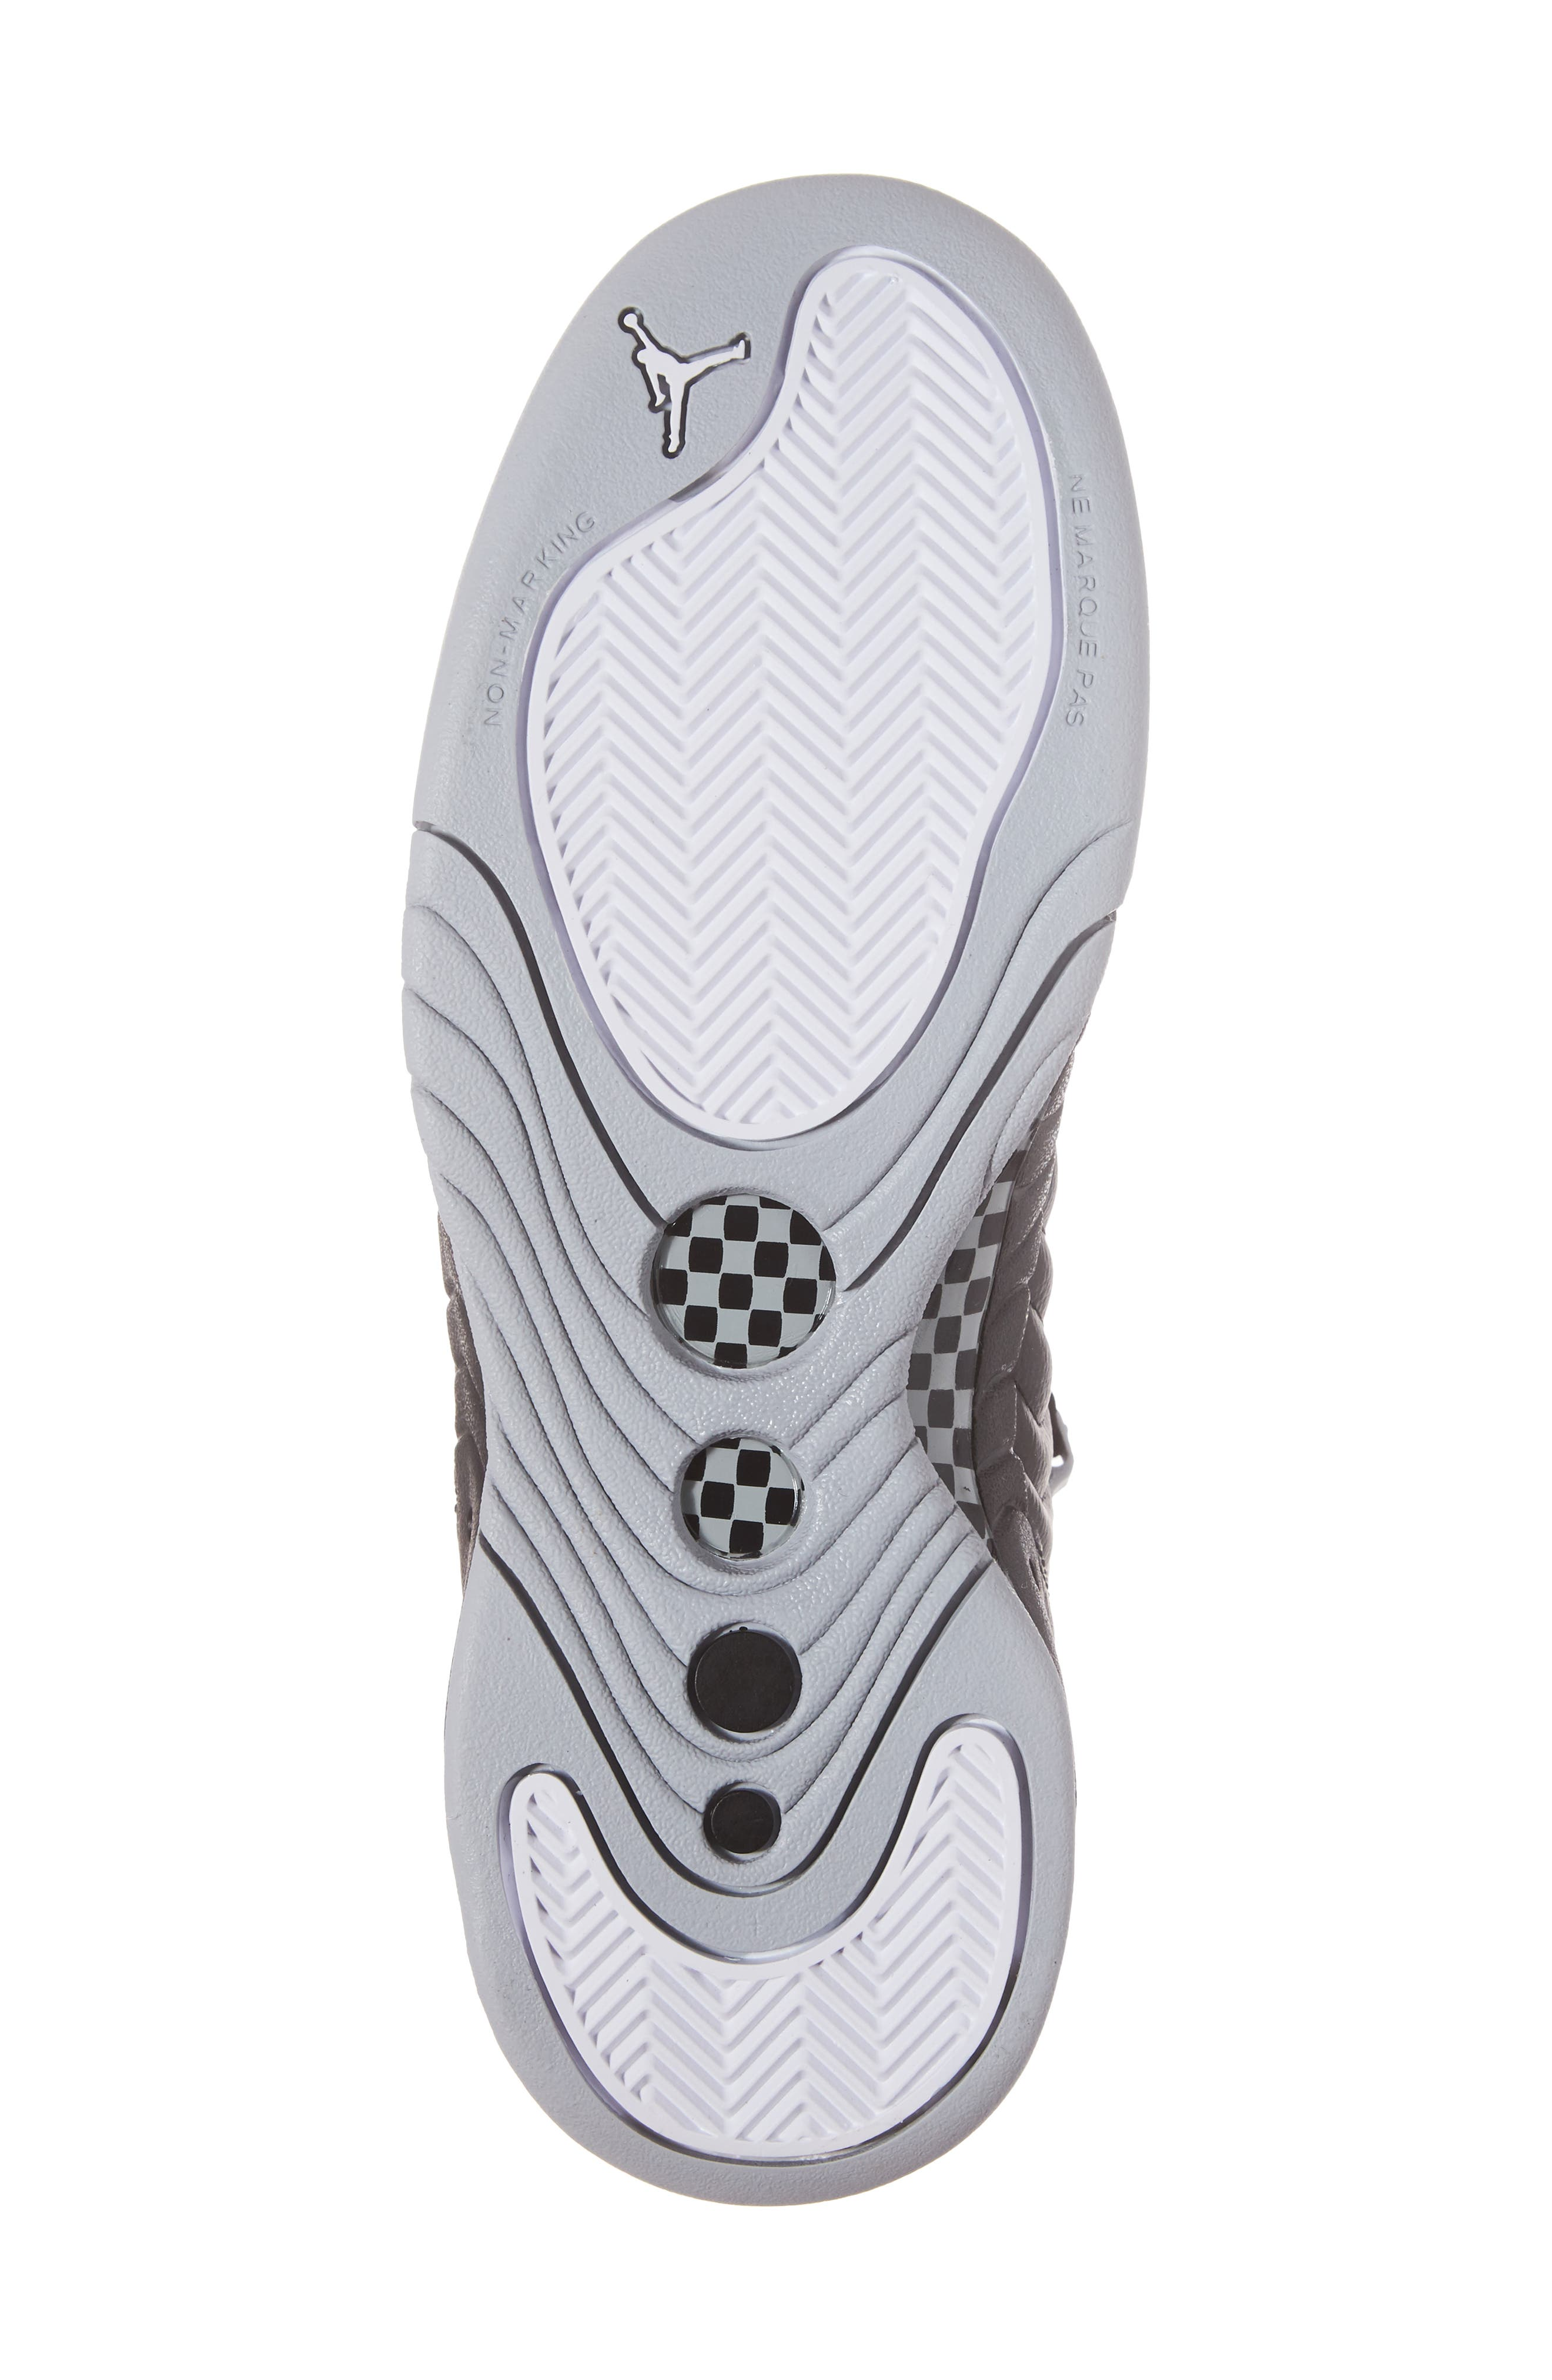 Jumpman Pro BG Mid Top Sneaker,                             Alternate thumbnail 6, color,                             012